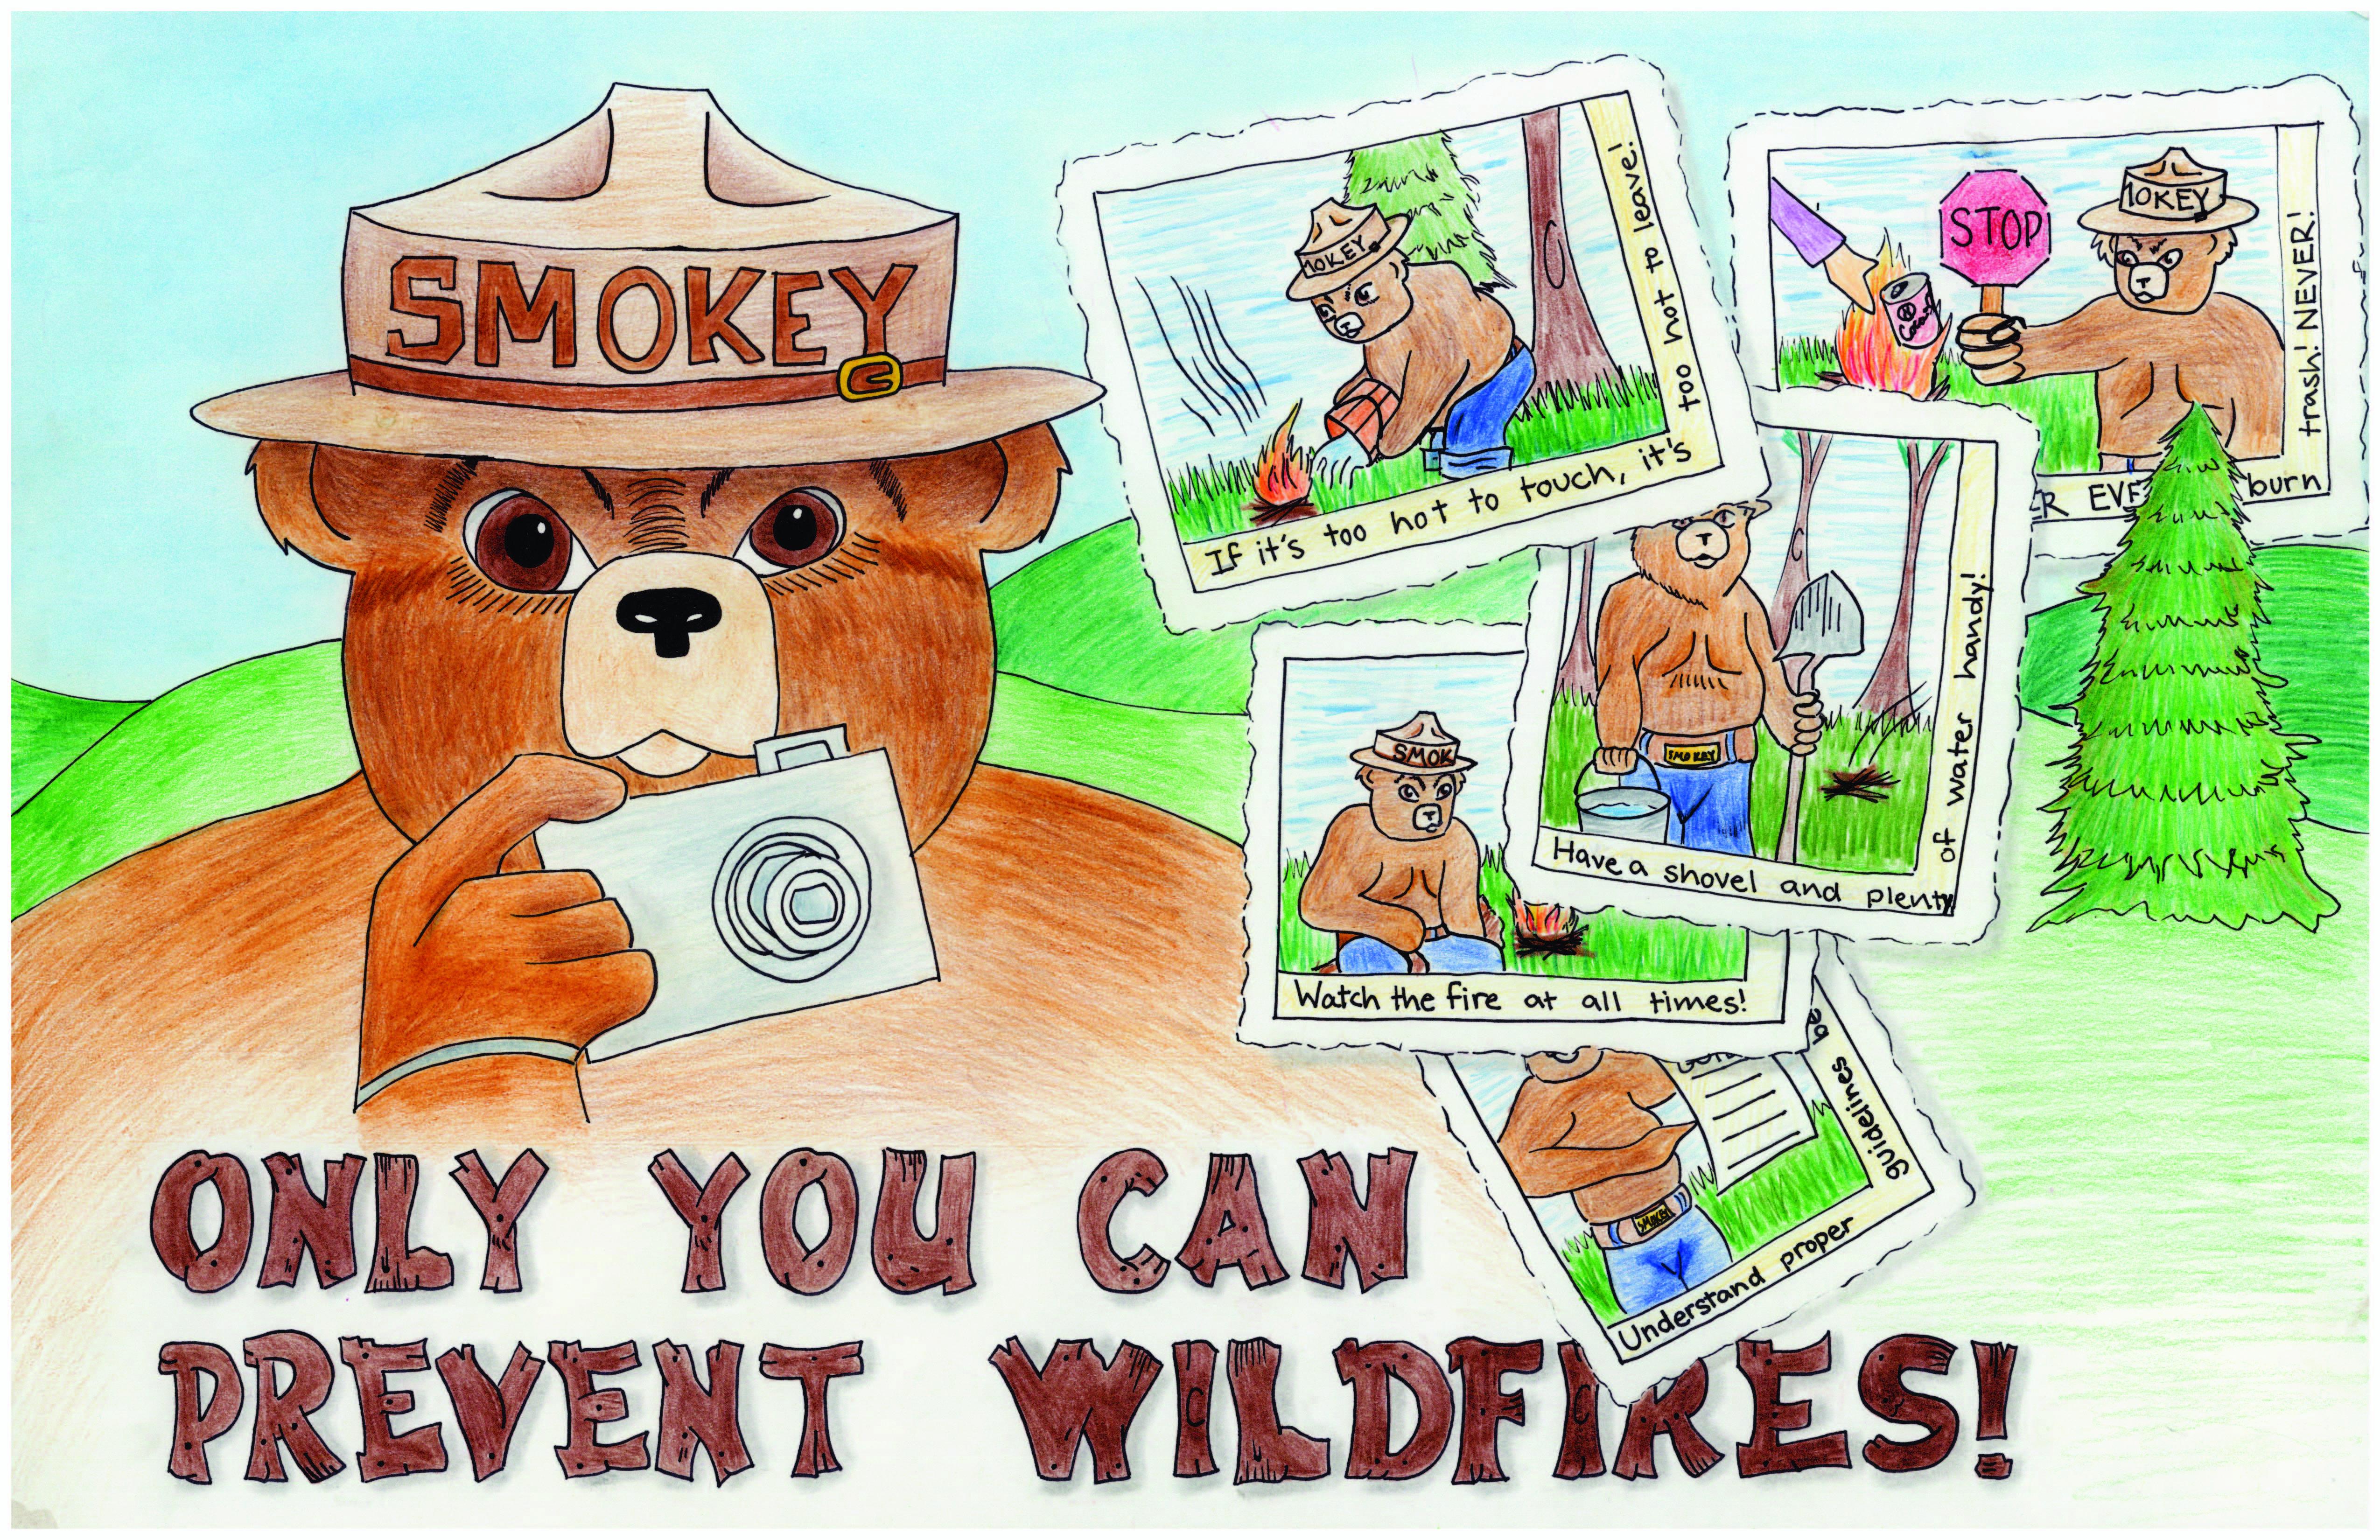 2014 Smokey Bear Poster Winner. Owl posters, Smokey the